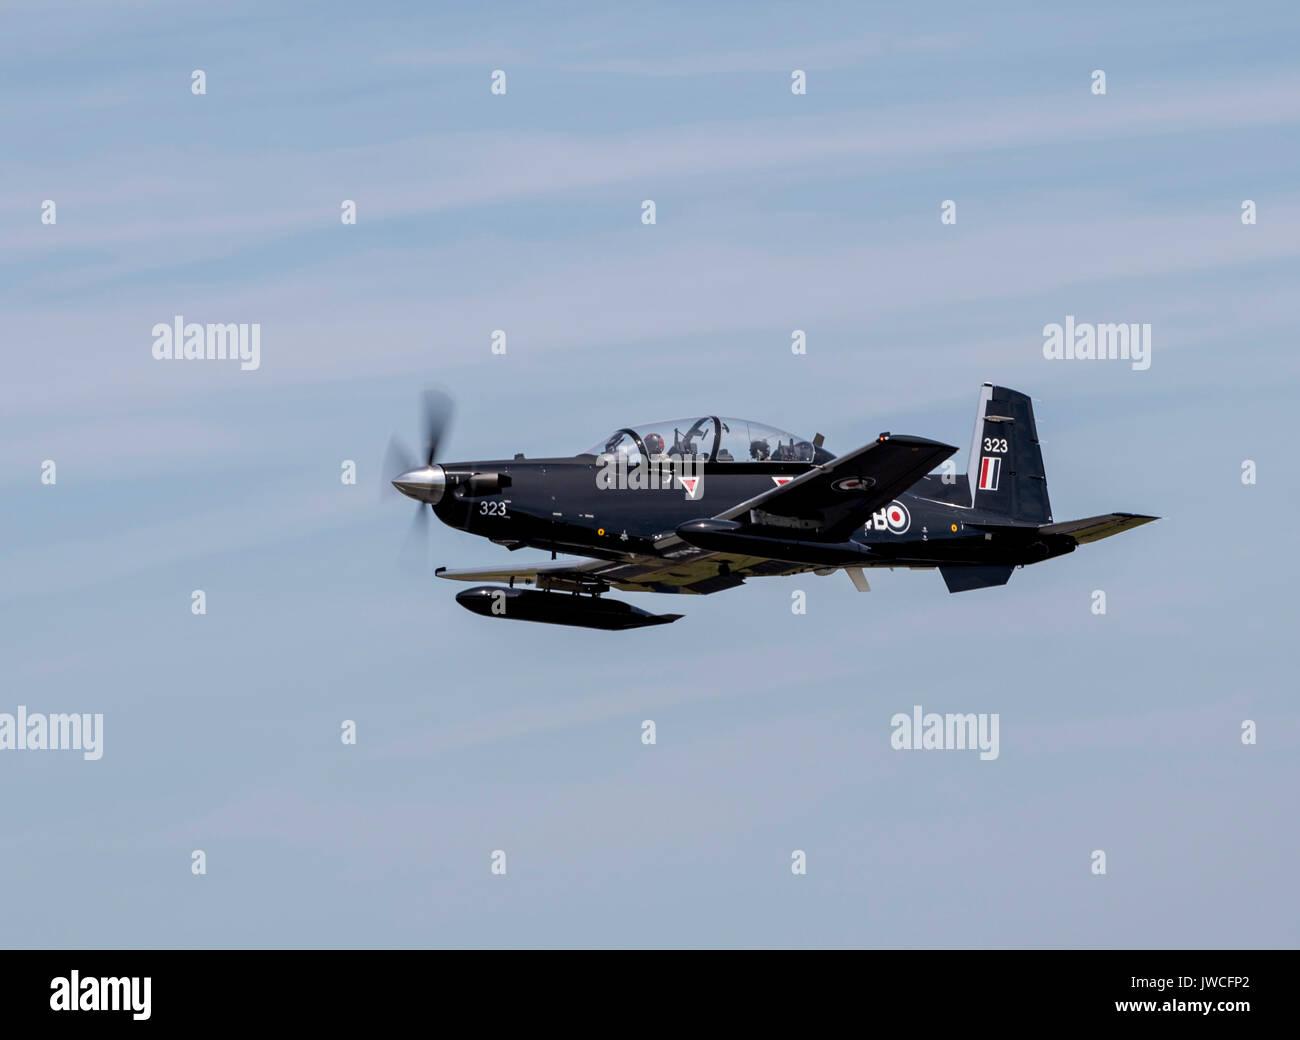 Beechcraft T6-C Texan - Stock Image